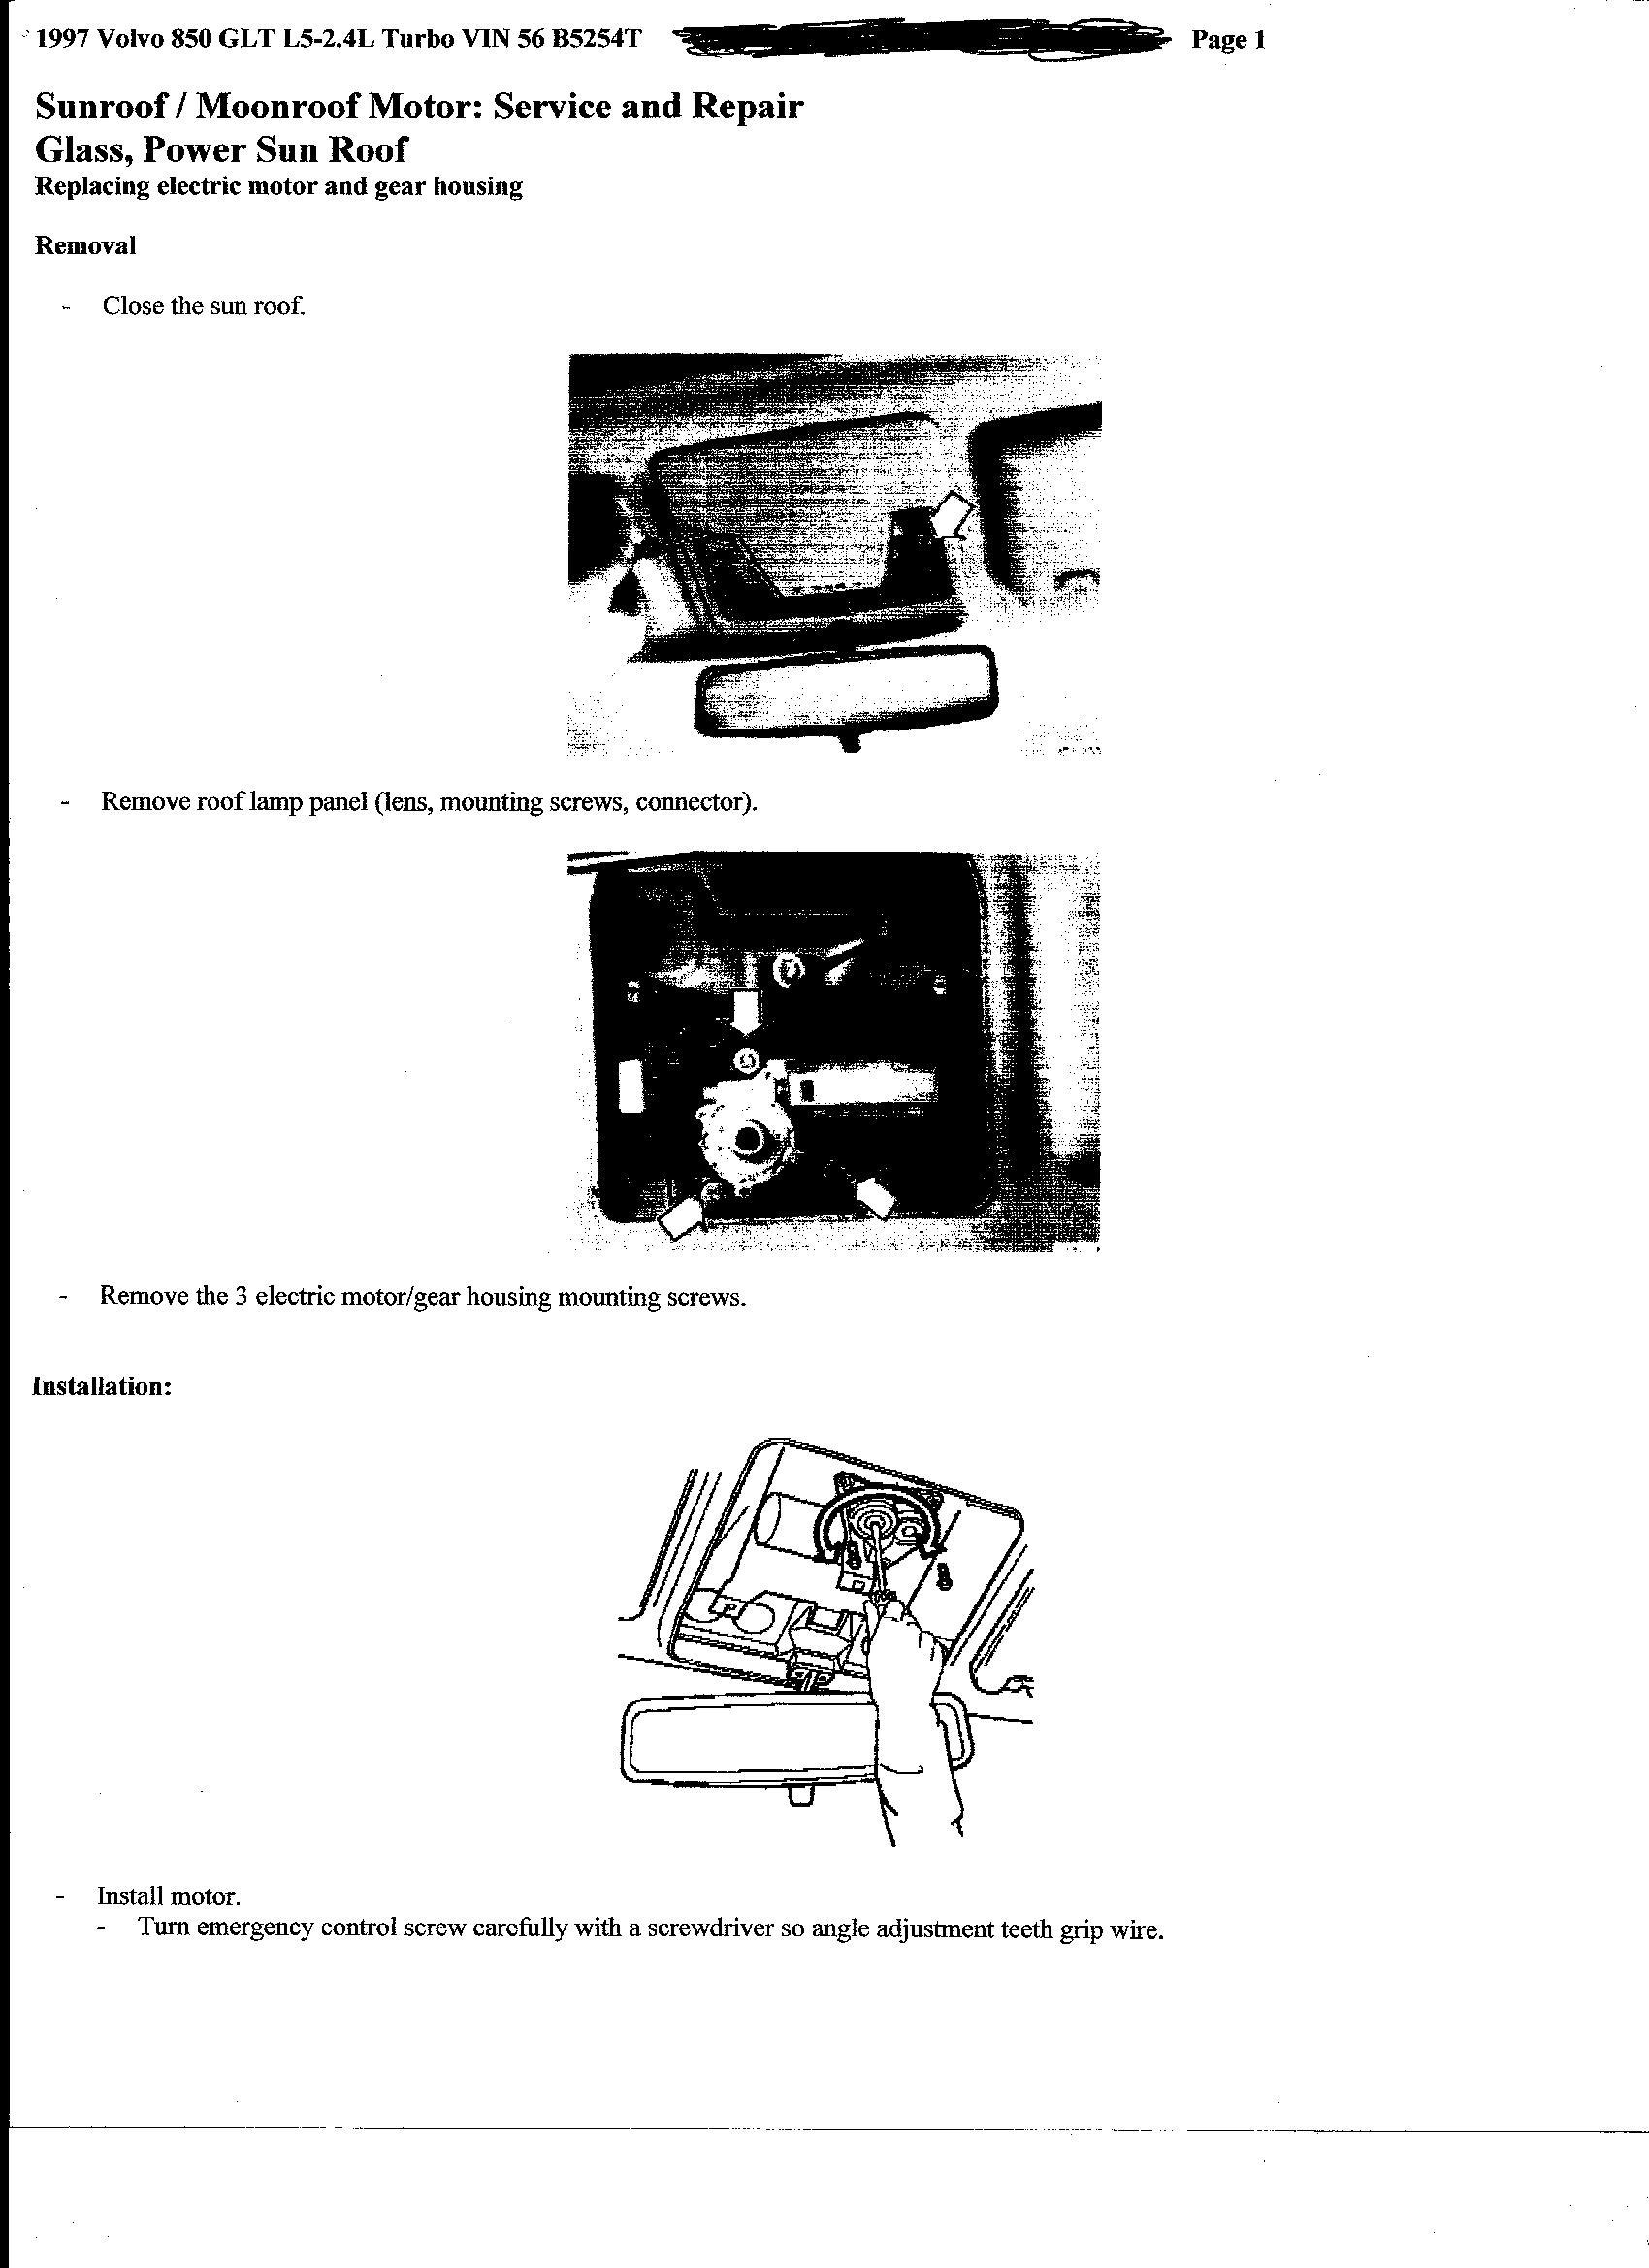 2003 volvo s60 manual close sunroof